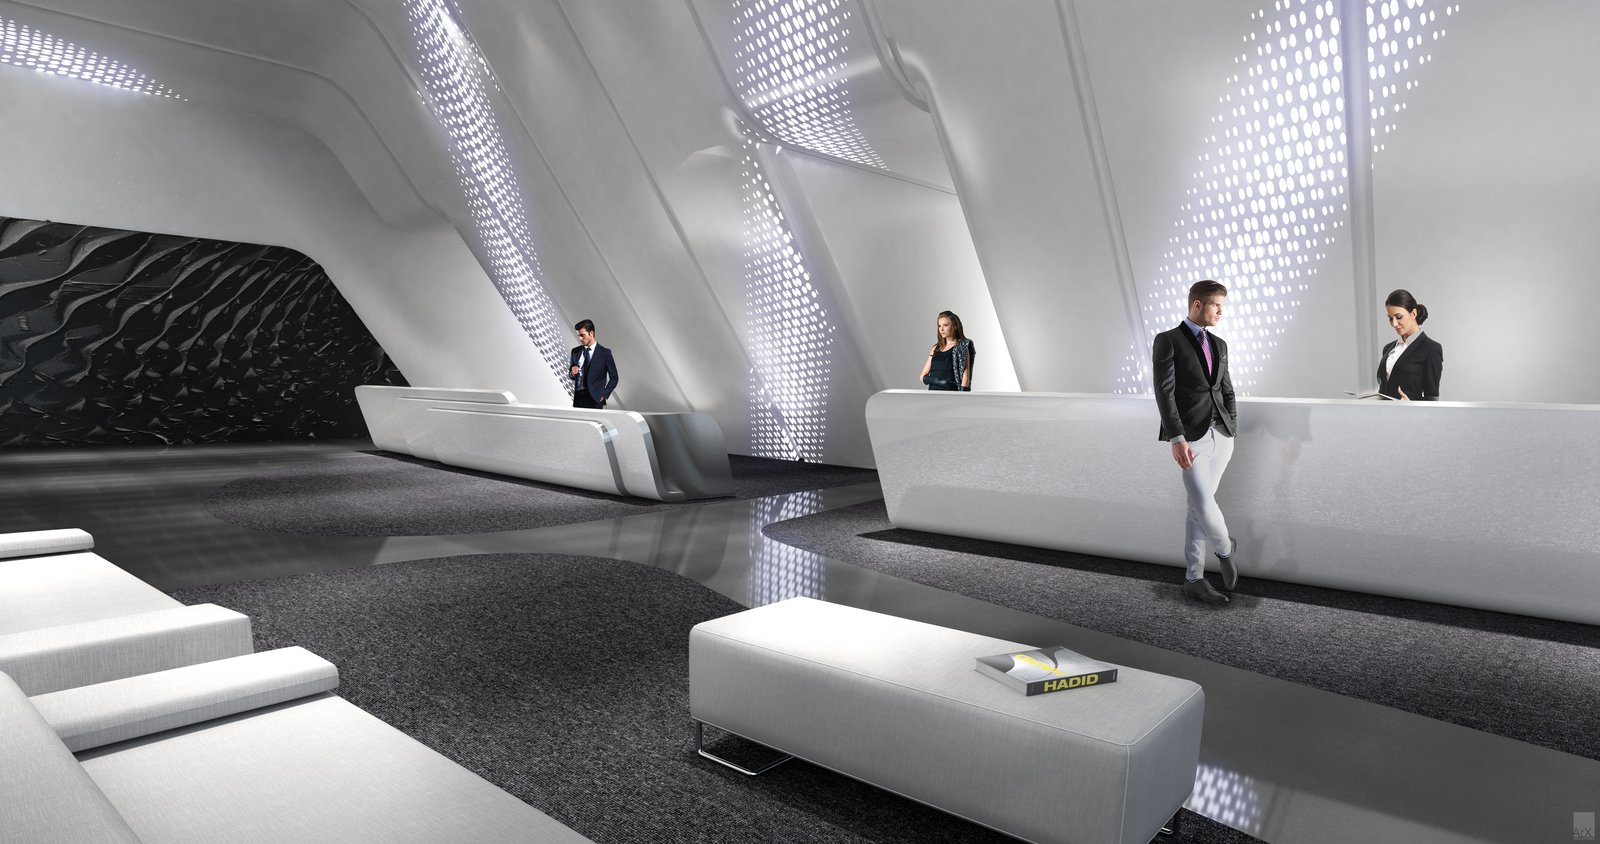 The Height of High Design: Tour Zaha Hadid's Skyscraper in Miami